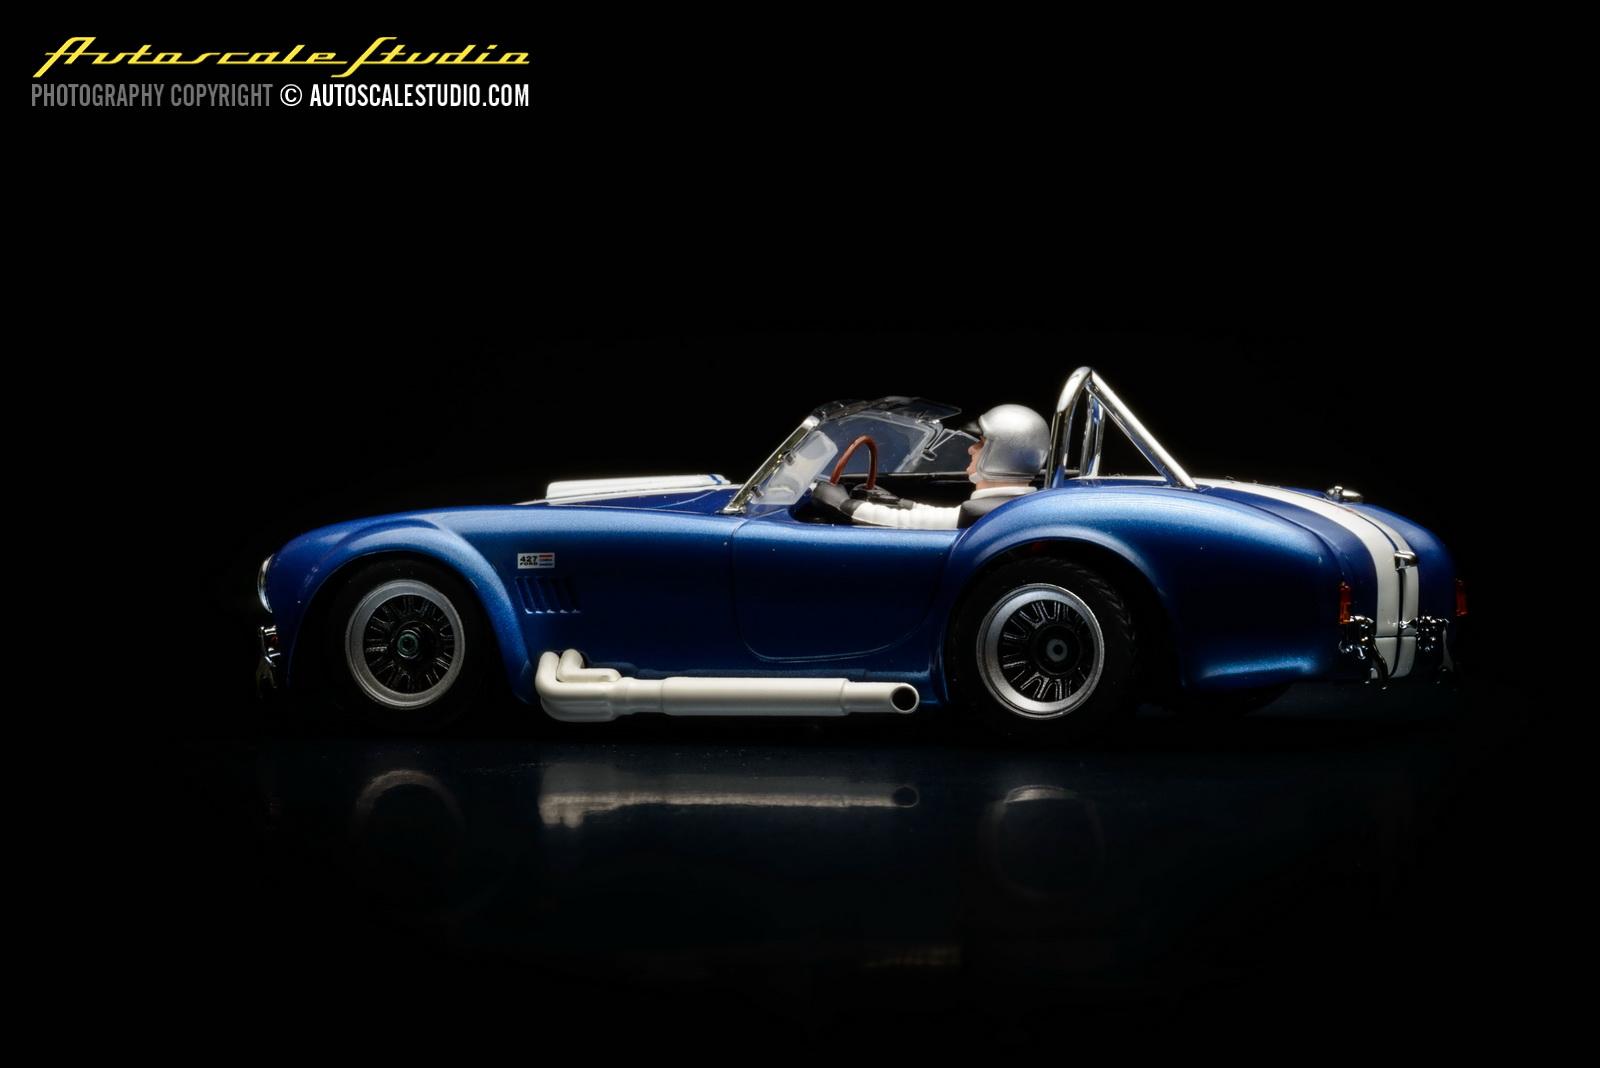 Autoscale studio mini z mzg38mb shelby cobra 427 s c metallic blue